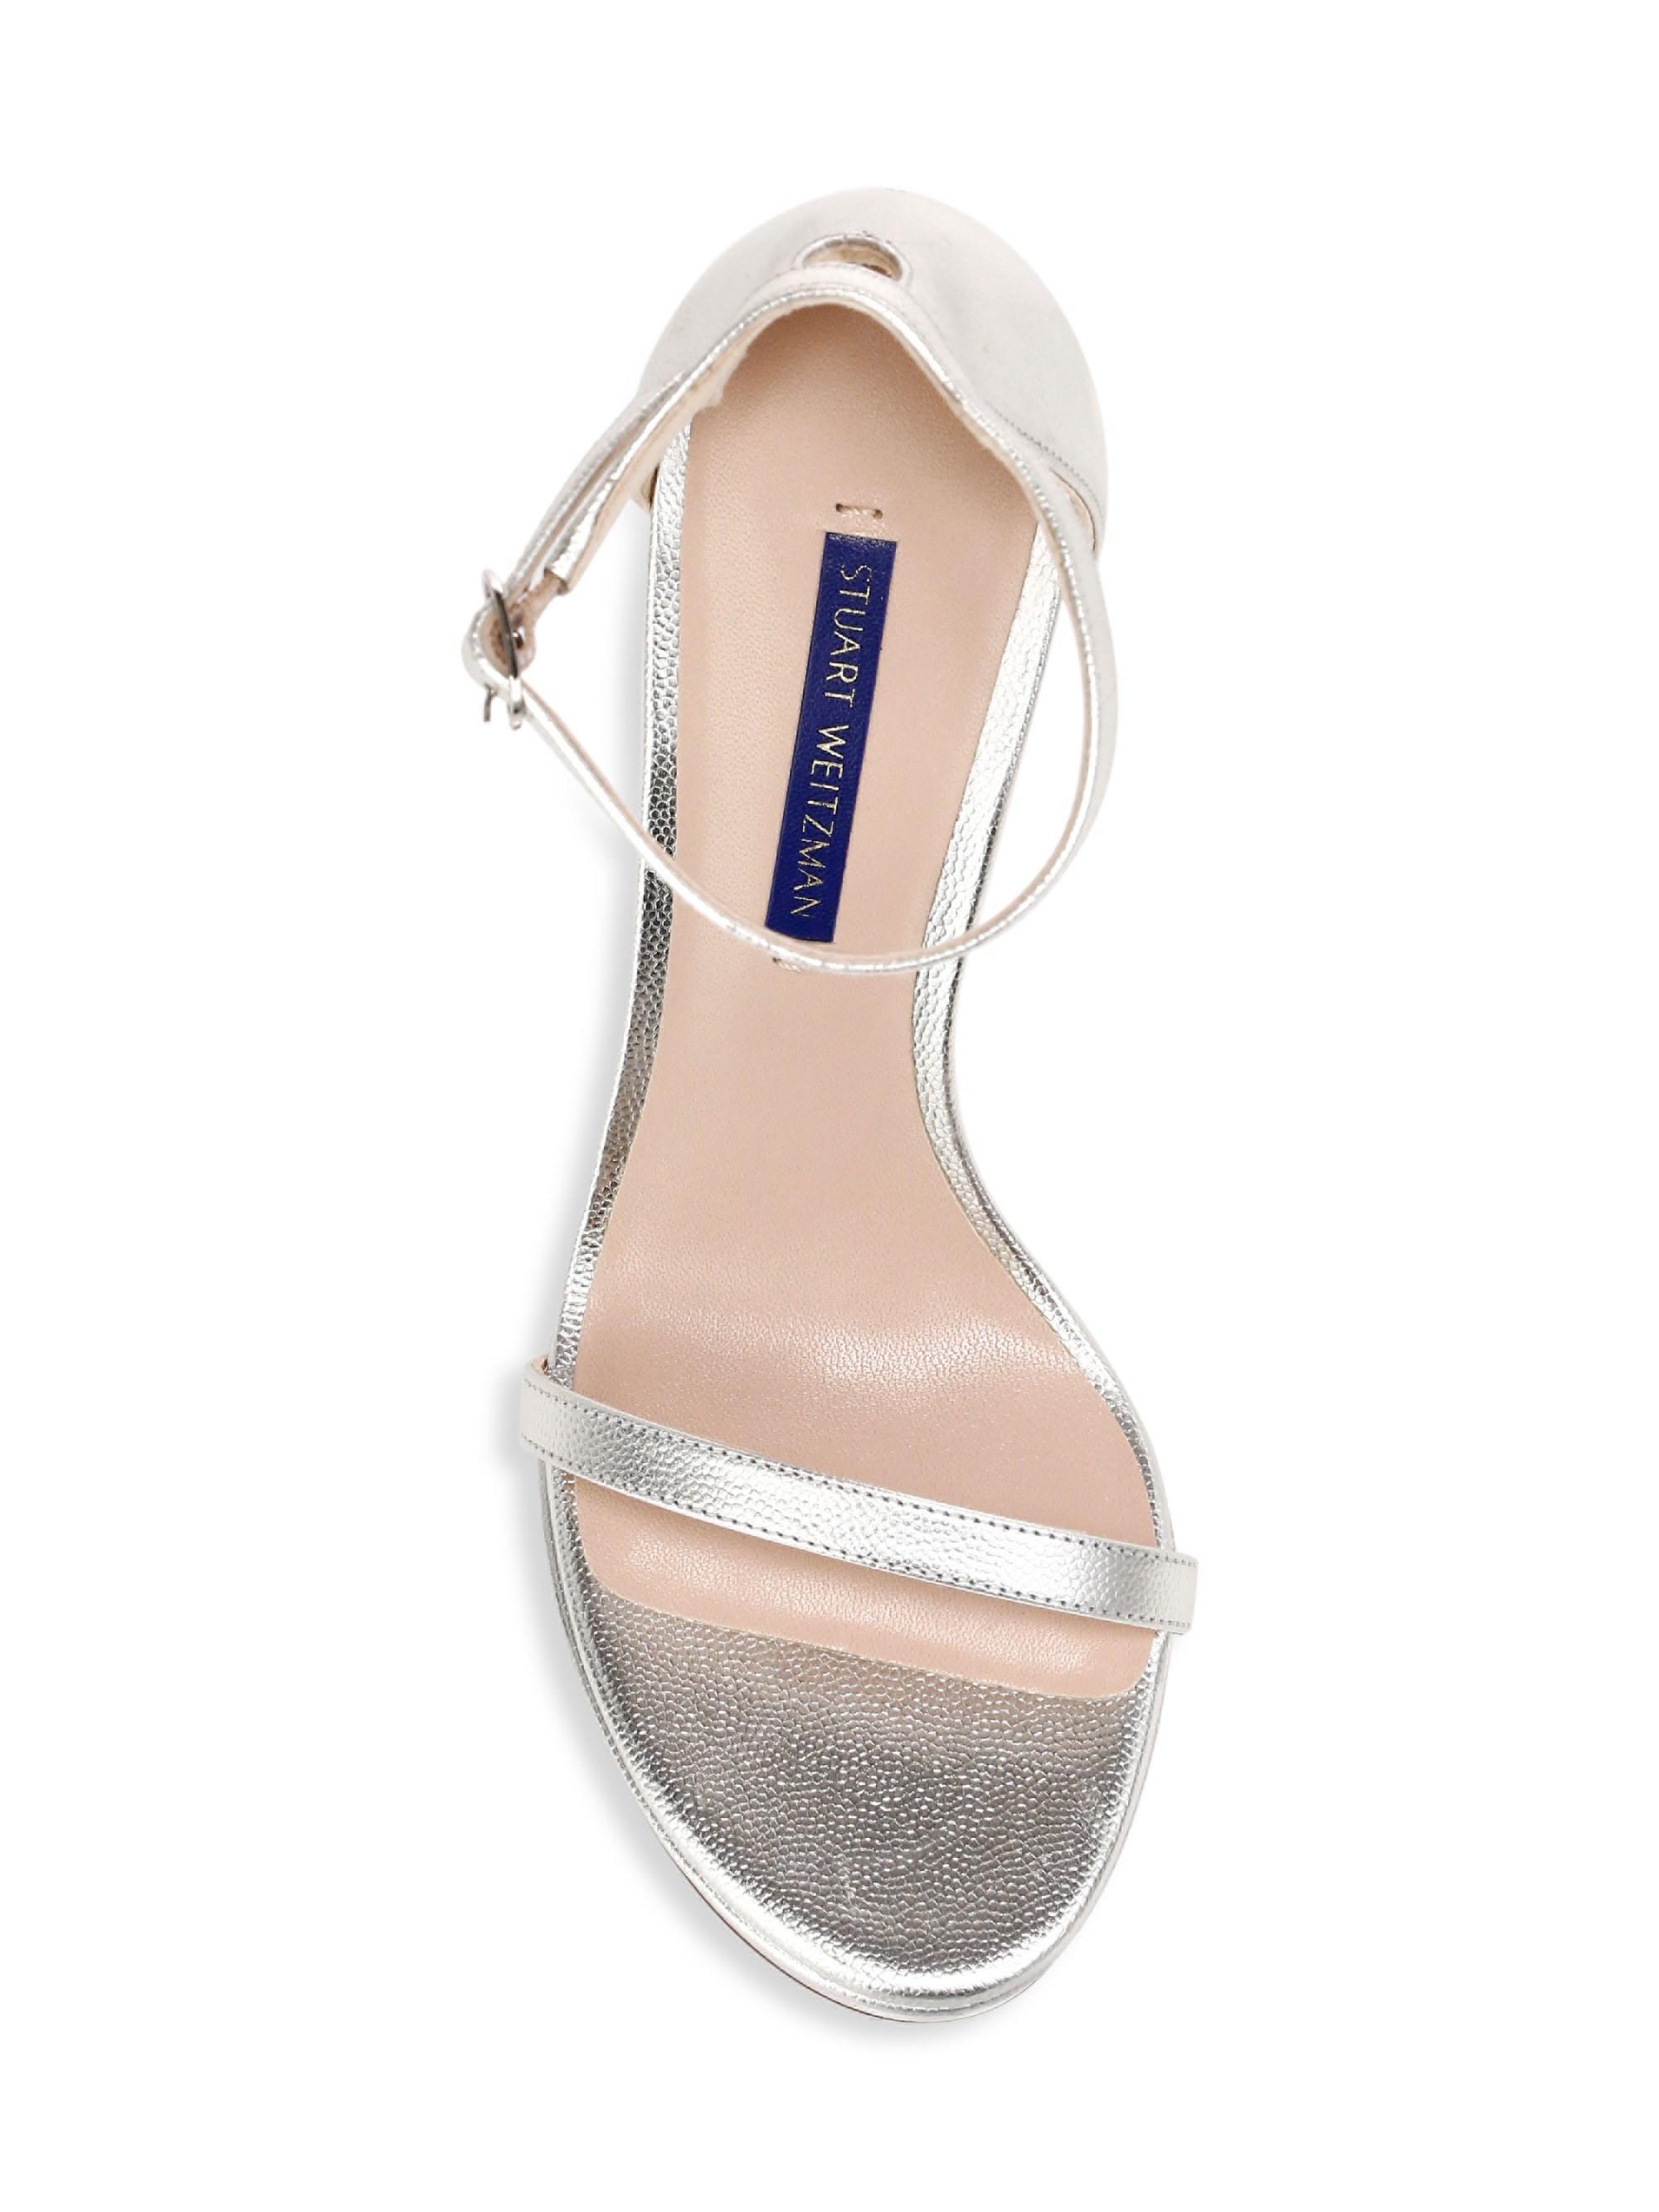 cb0a10dda Stuart Weitzman - Women s Nudist Metallic Platform Sandals - Silver - Lyst.  View fullscreen